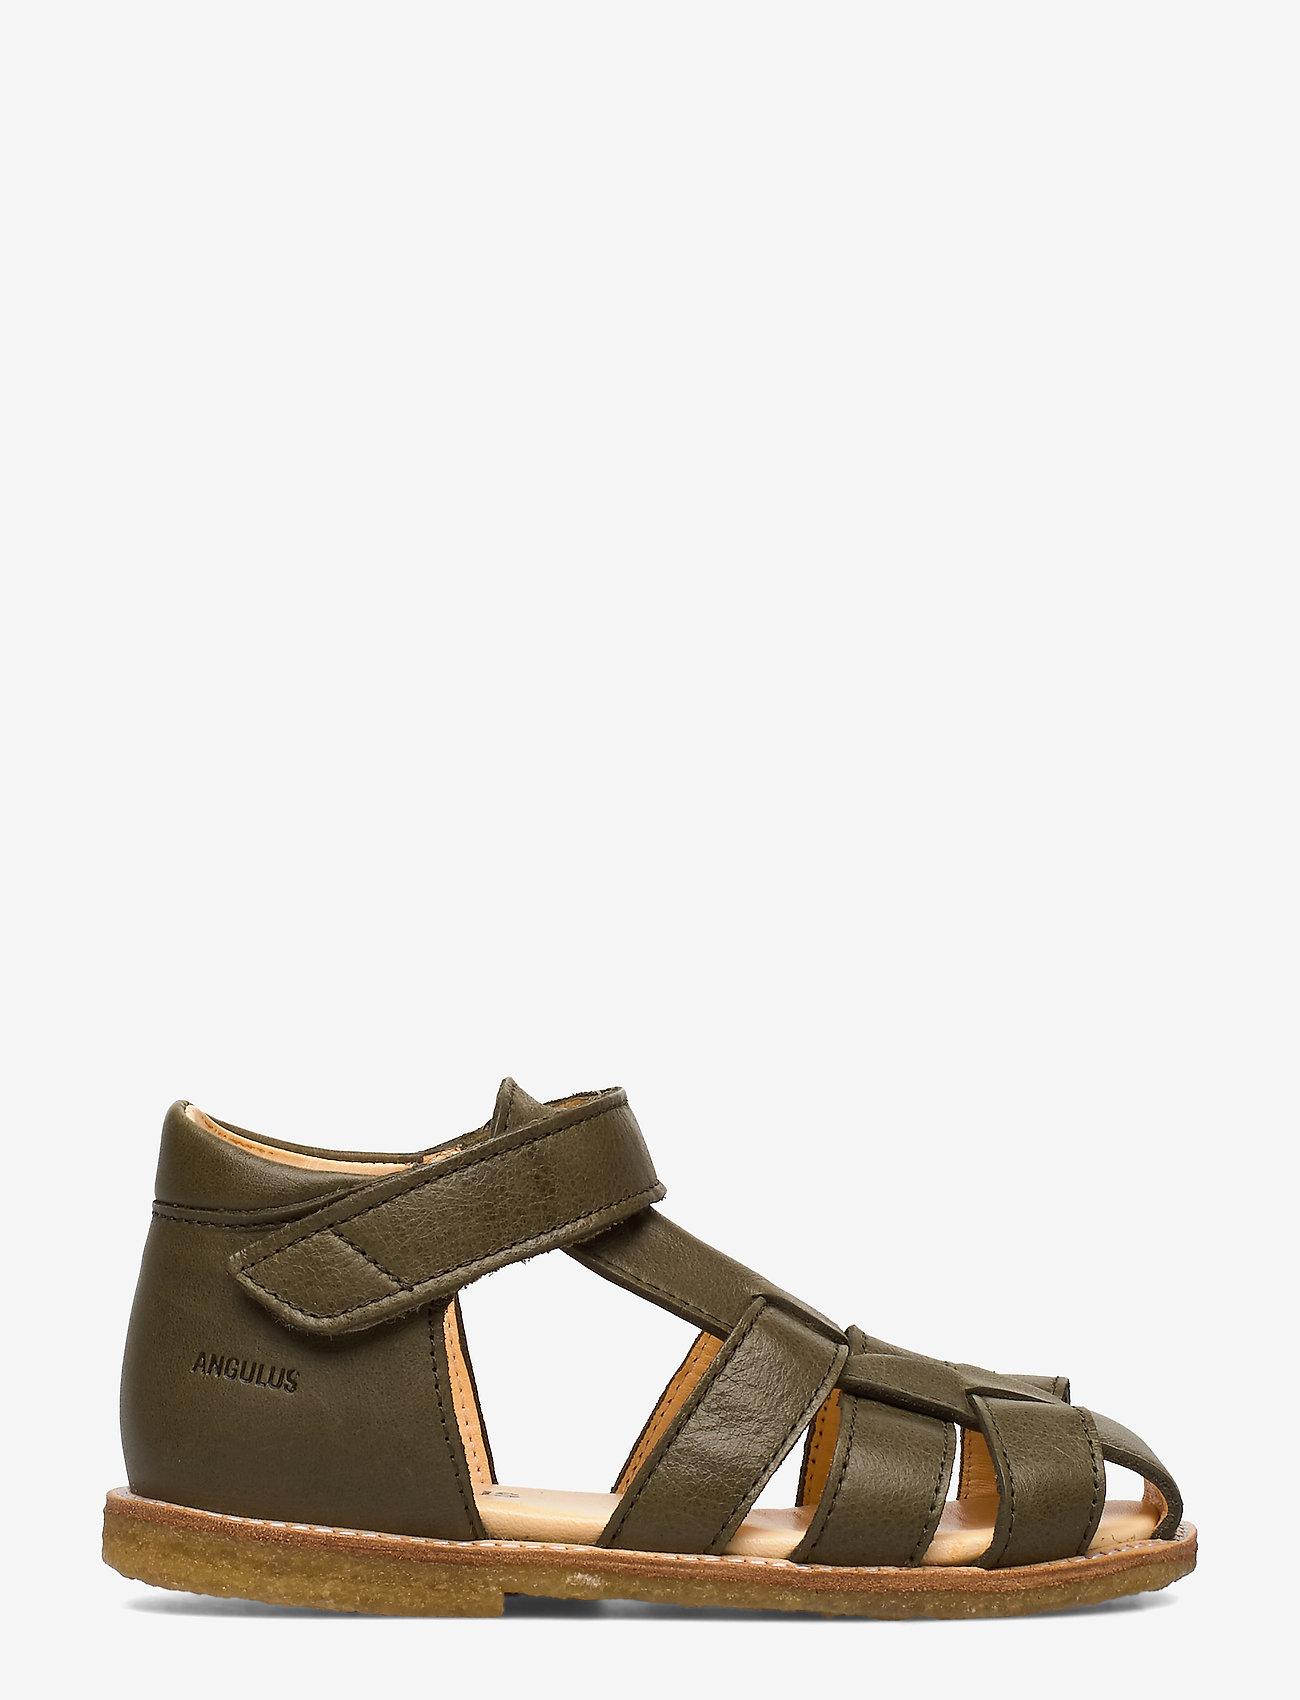 ANGULUS - Baby sandal - sandals - 2638 khaki - 1